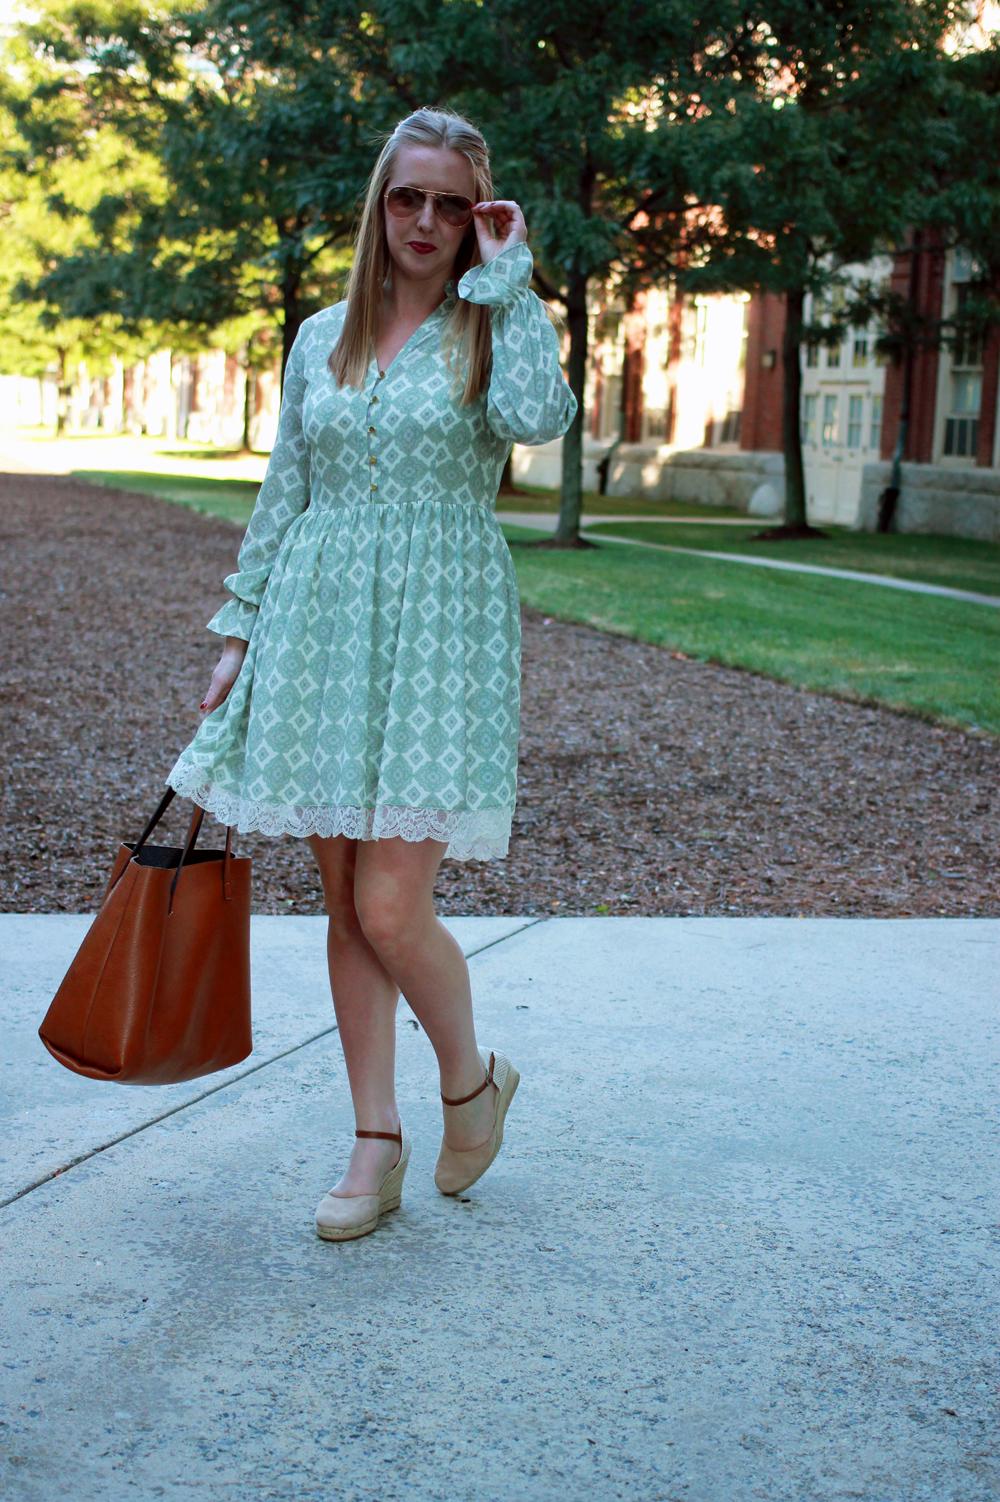 highline collective medallion peasant dress, peasant dress, boston style blogger, boston fashion blogger, boston blogger summer, lord and taylor dresses, highline collective dresses,